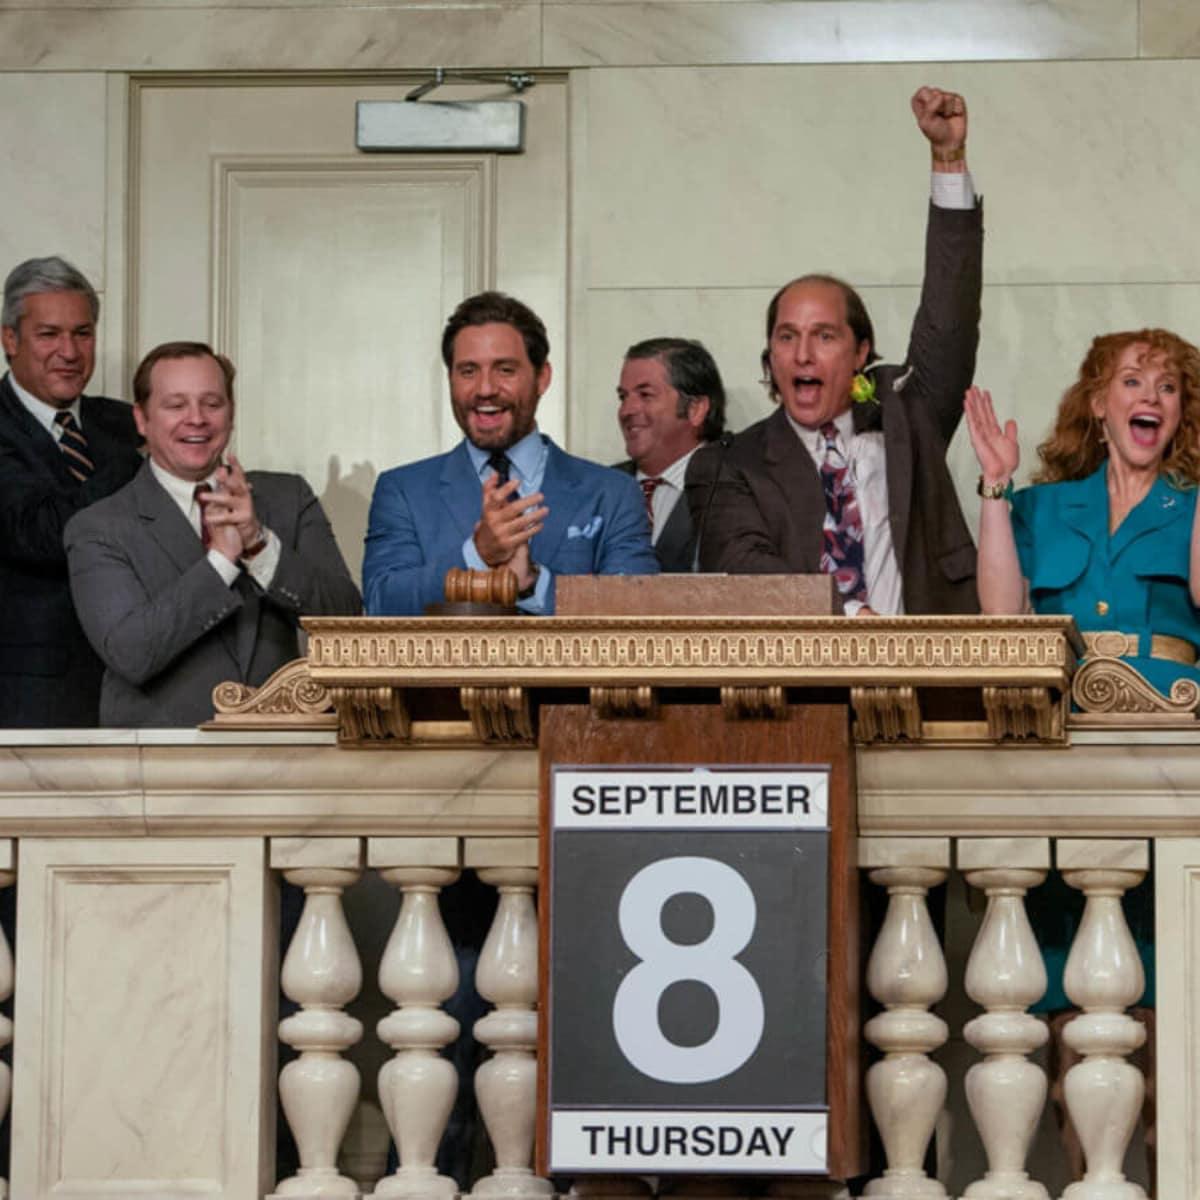 Edgar Ramirez, Matthew McConaughey, and Bryce Dallas Howard in Gold